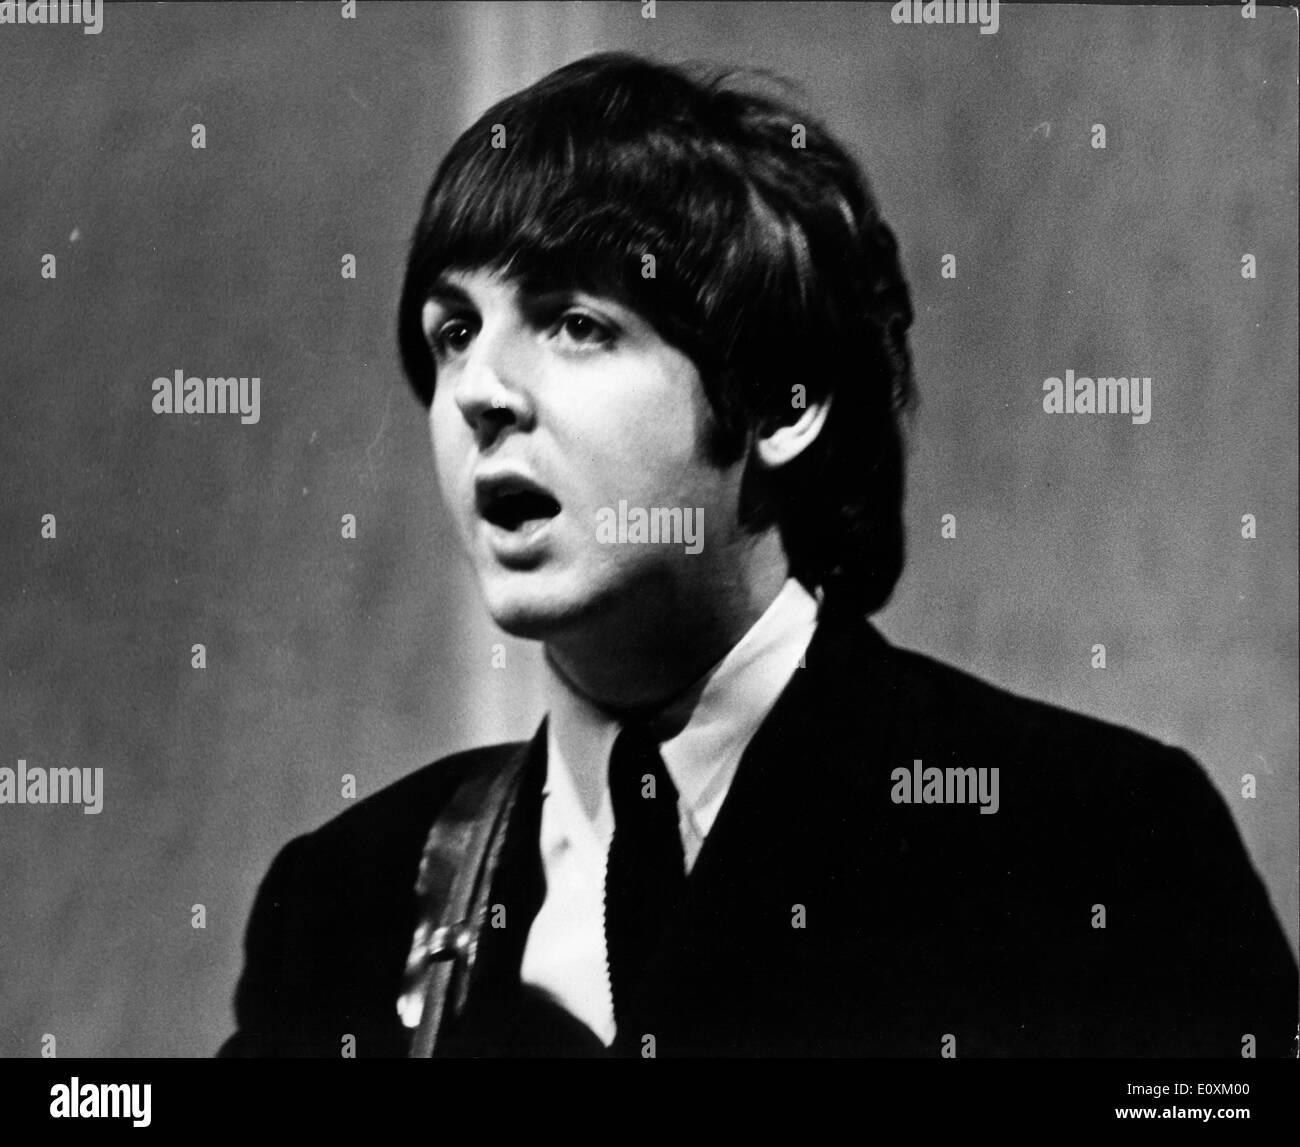 The Beatles Paul McCartney Singing